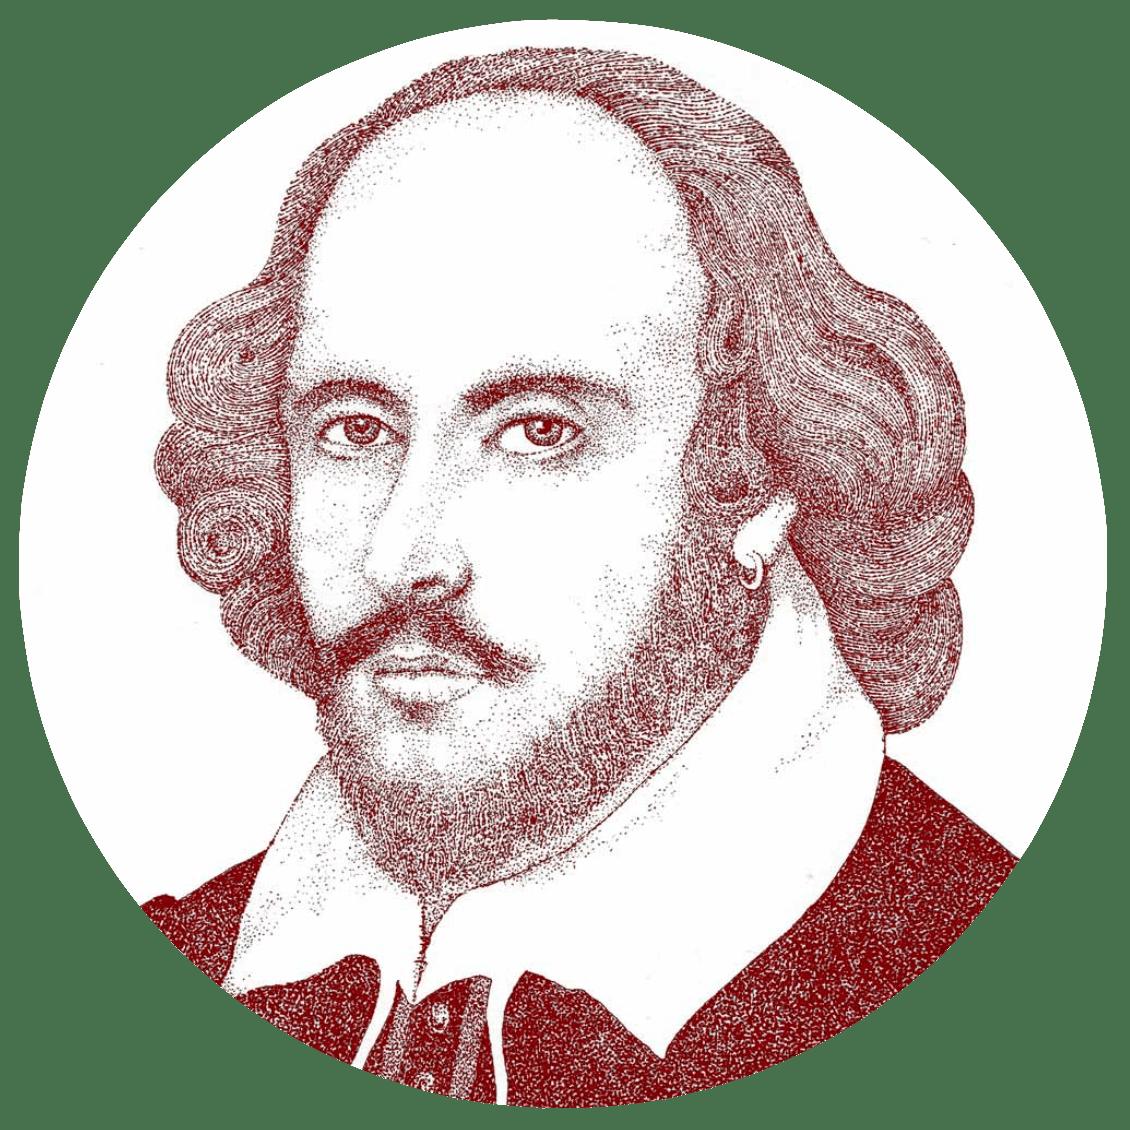 Шекспир картинки для презентации, открытка юбилеем